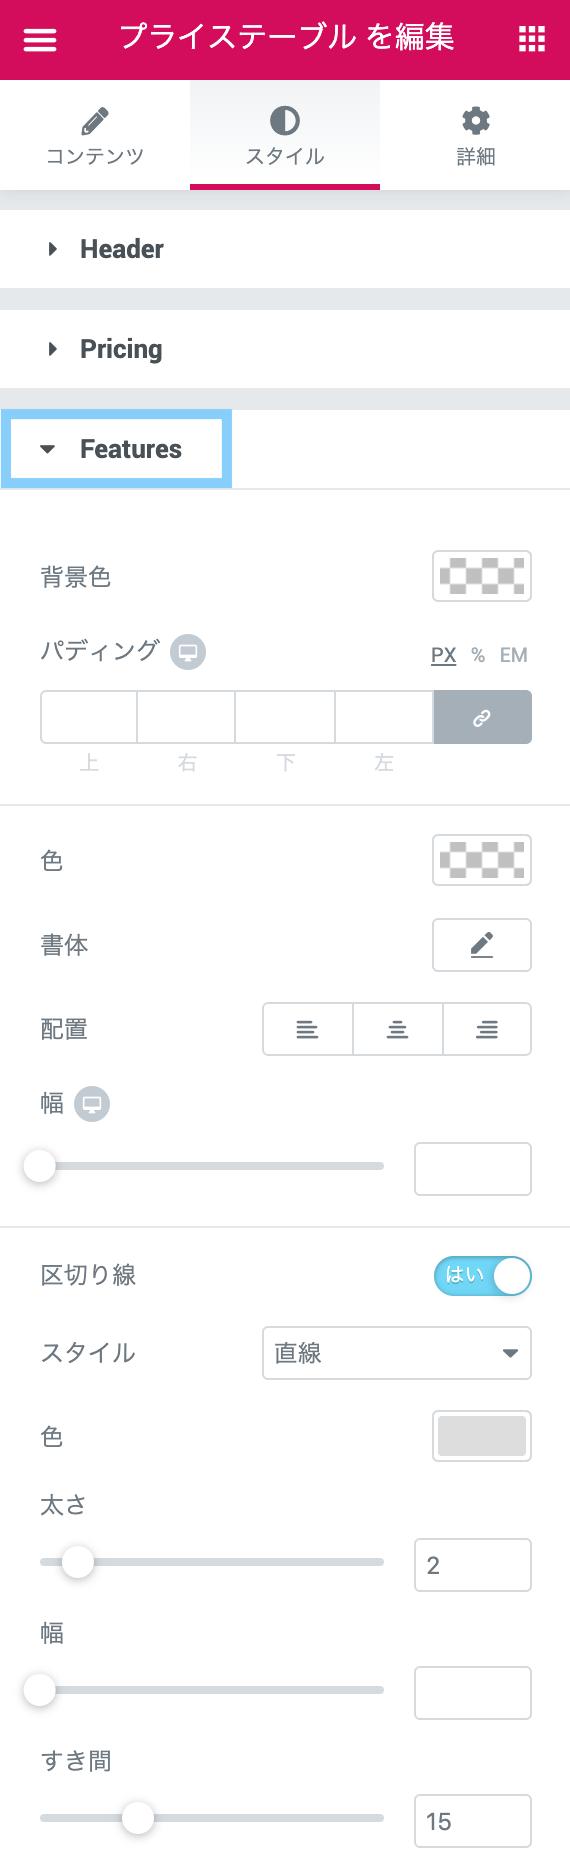 Elementor プライステーブル スタイル Features 1